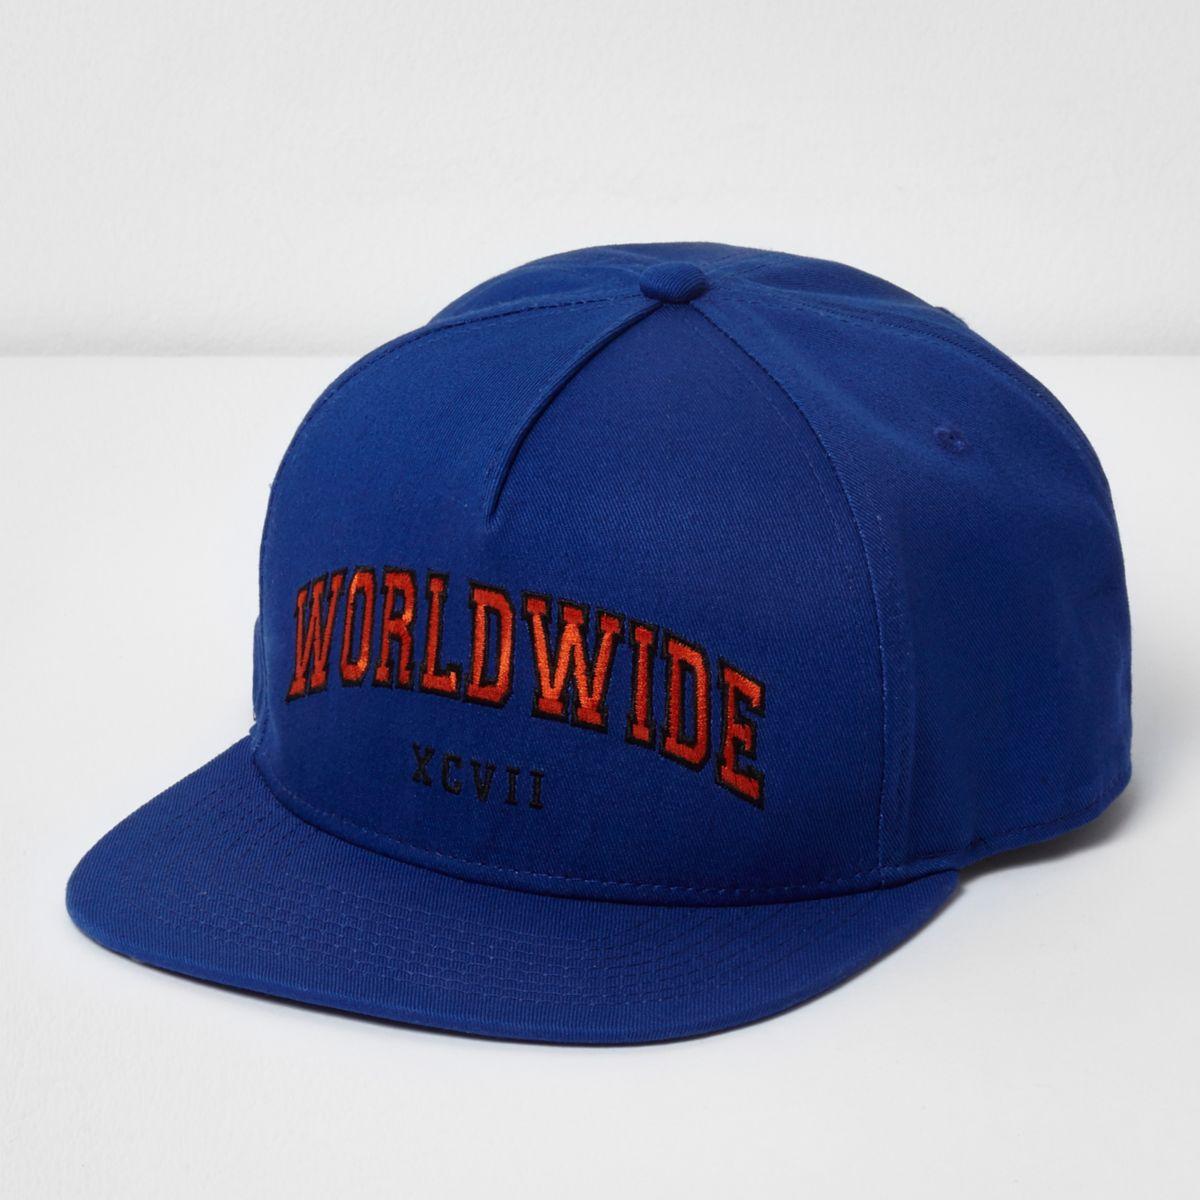 Blue 'worldwide' snapback flat peak cap